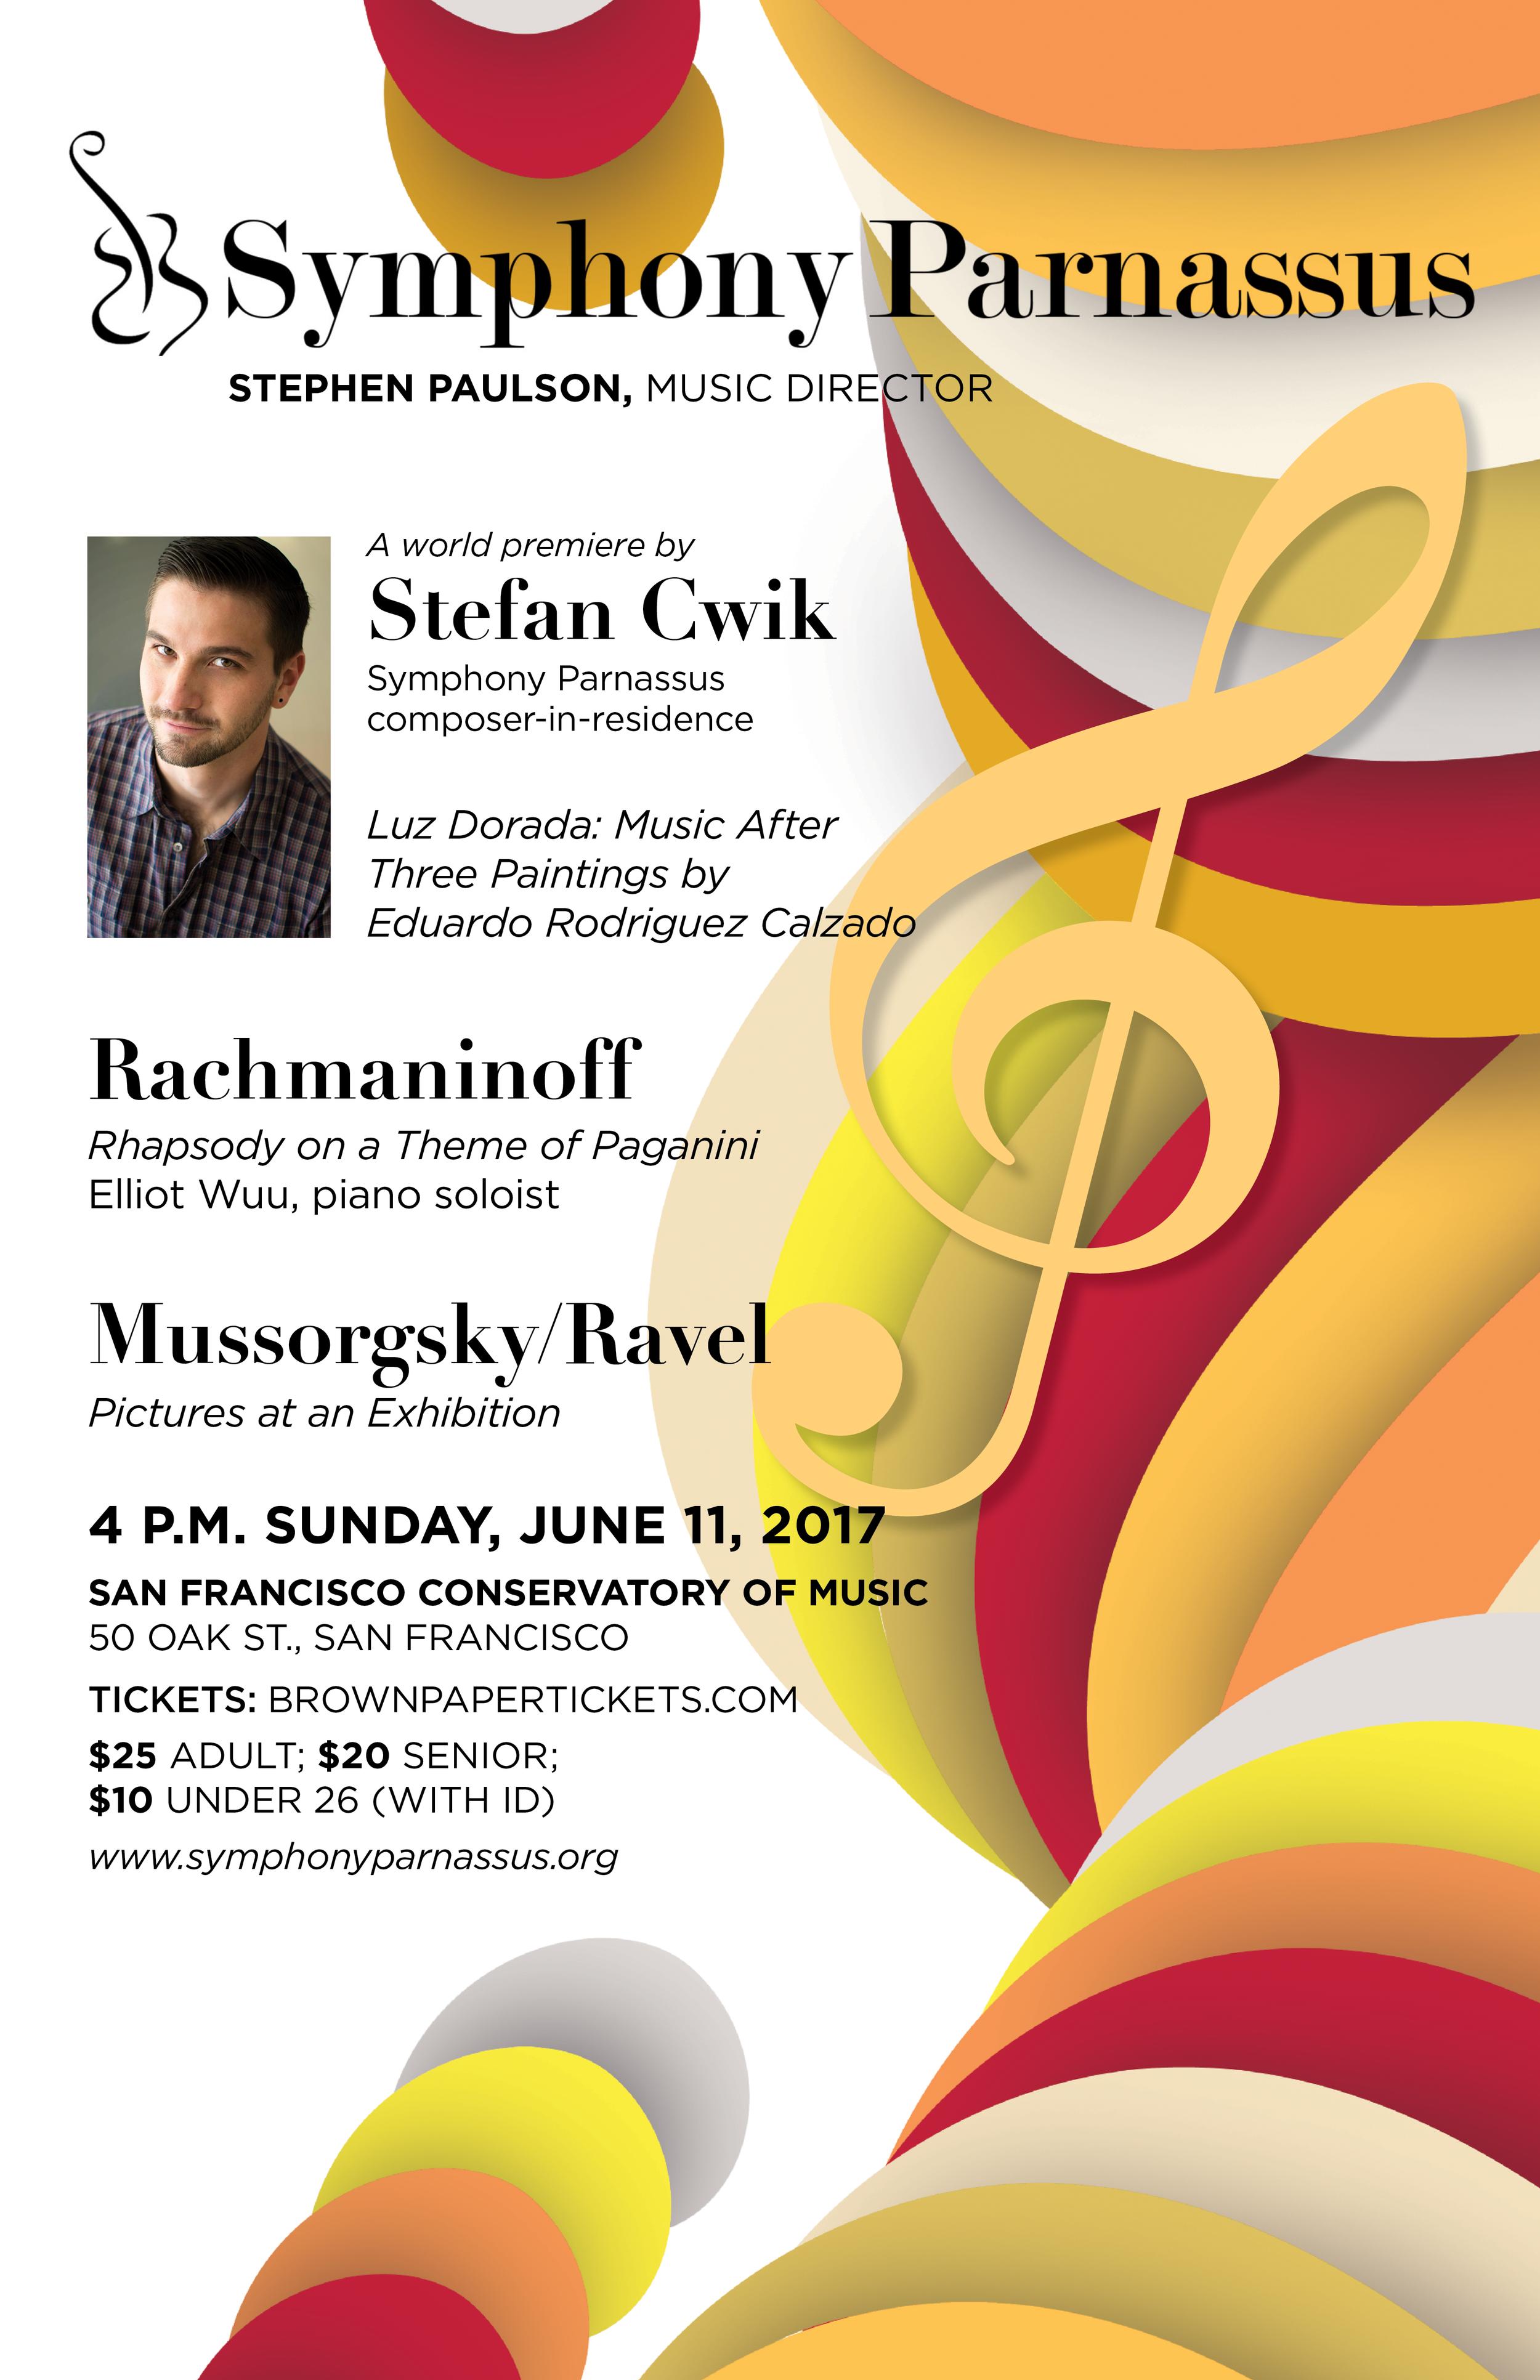 Symphony Parnassus June 11 2017 Poster.png